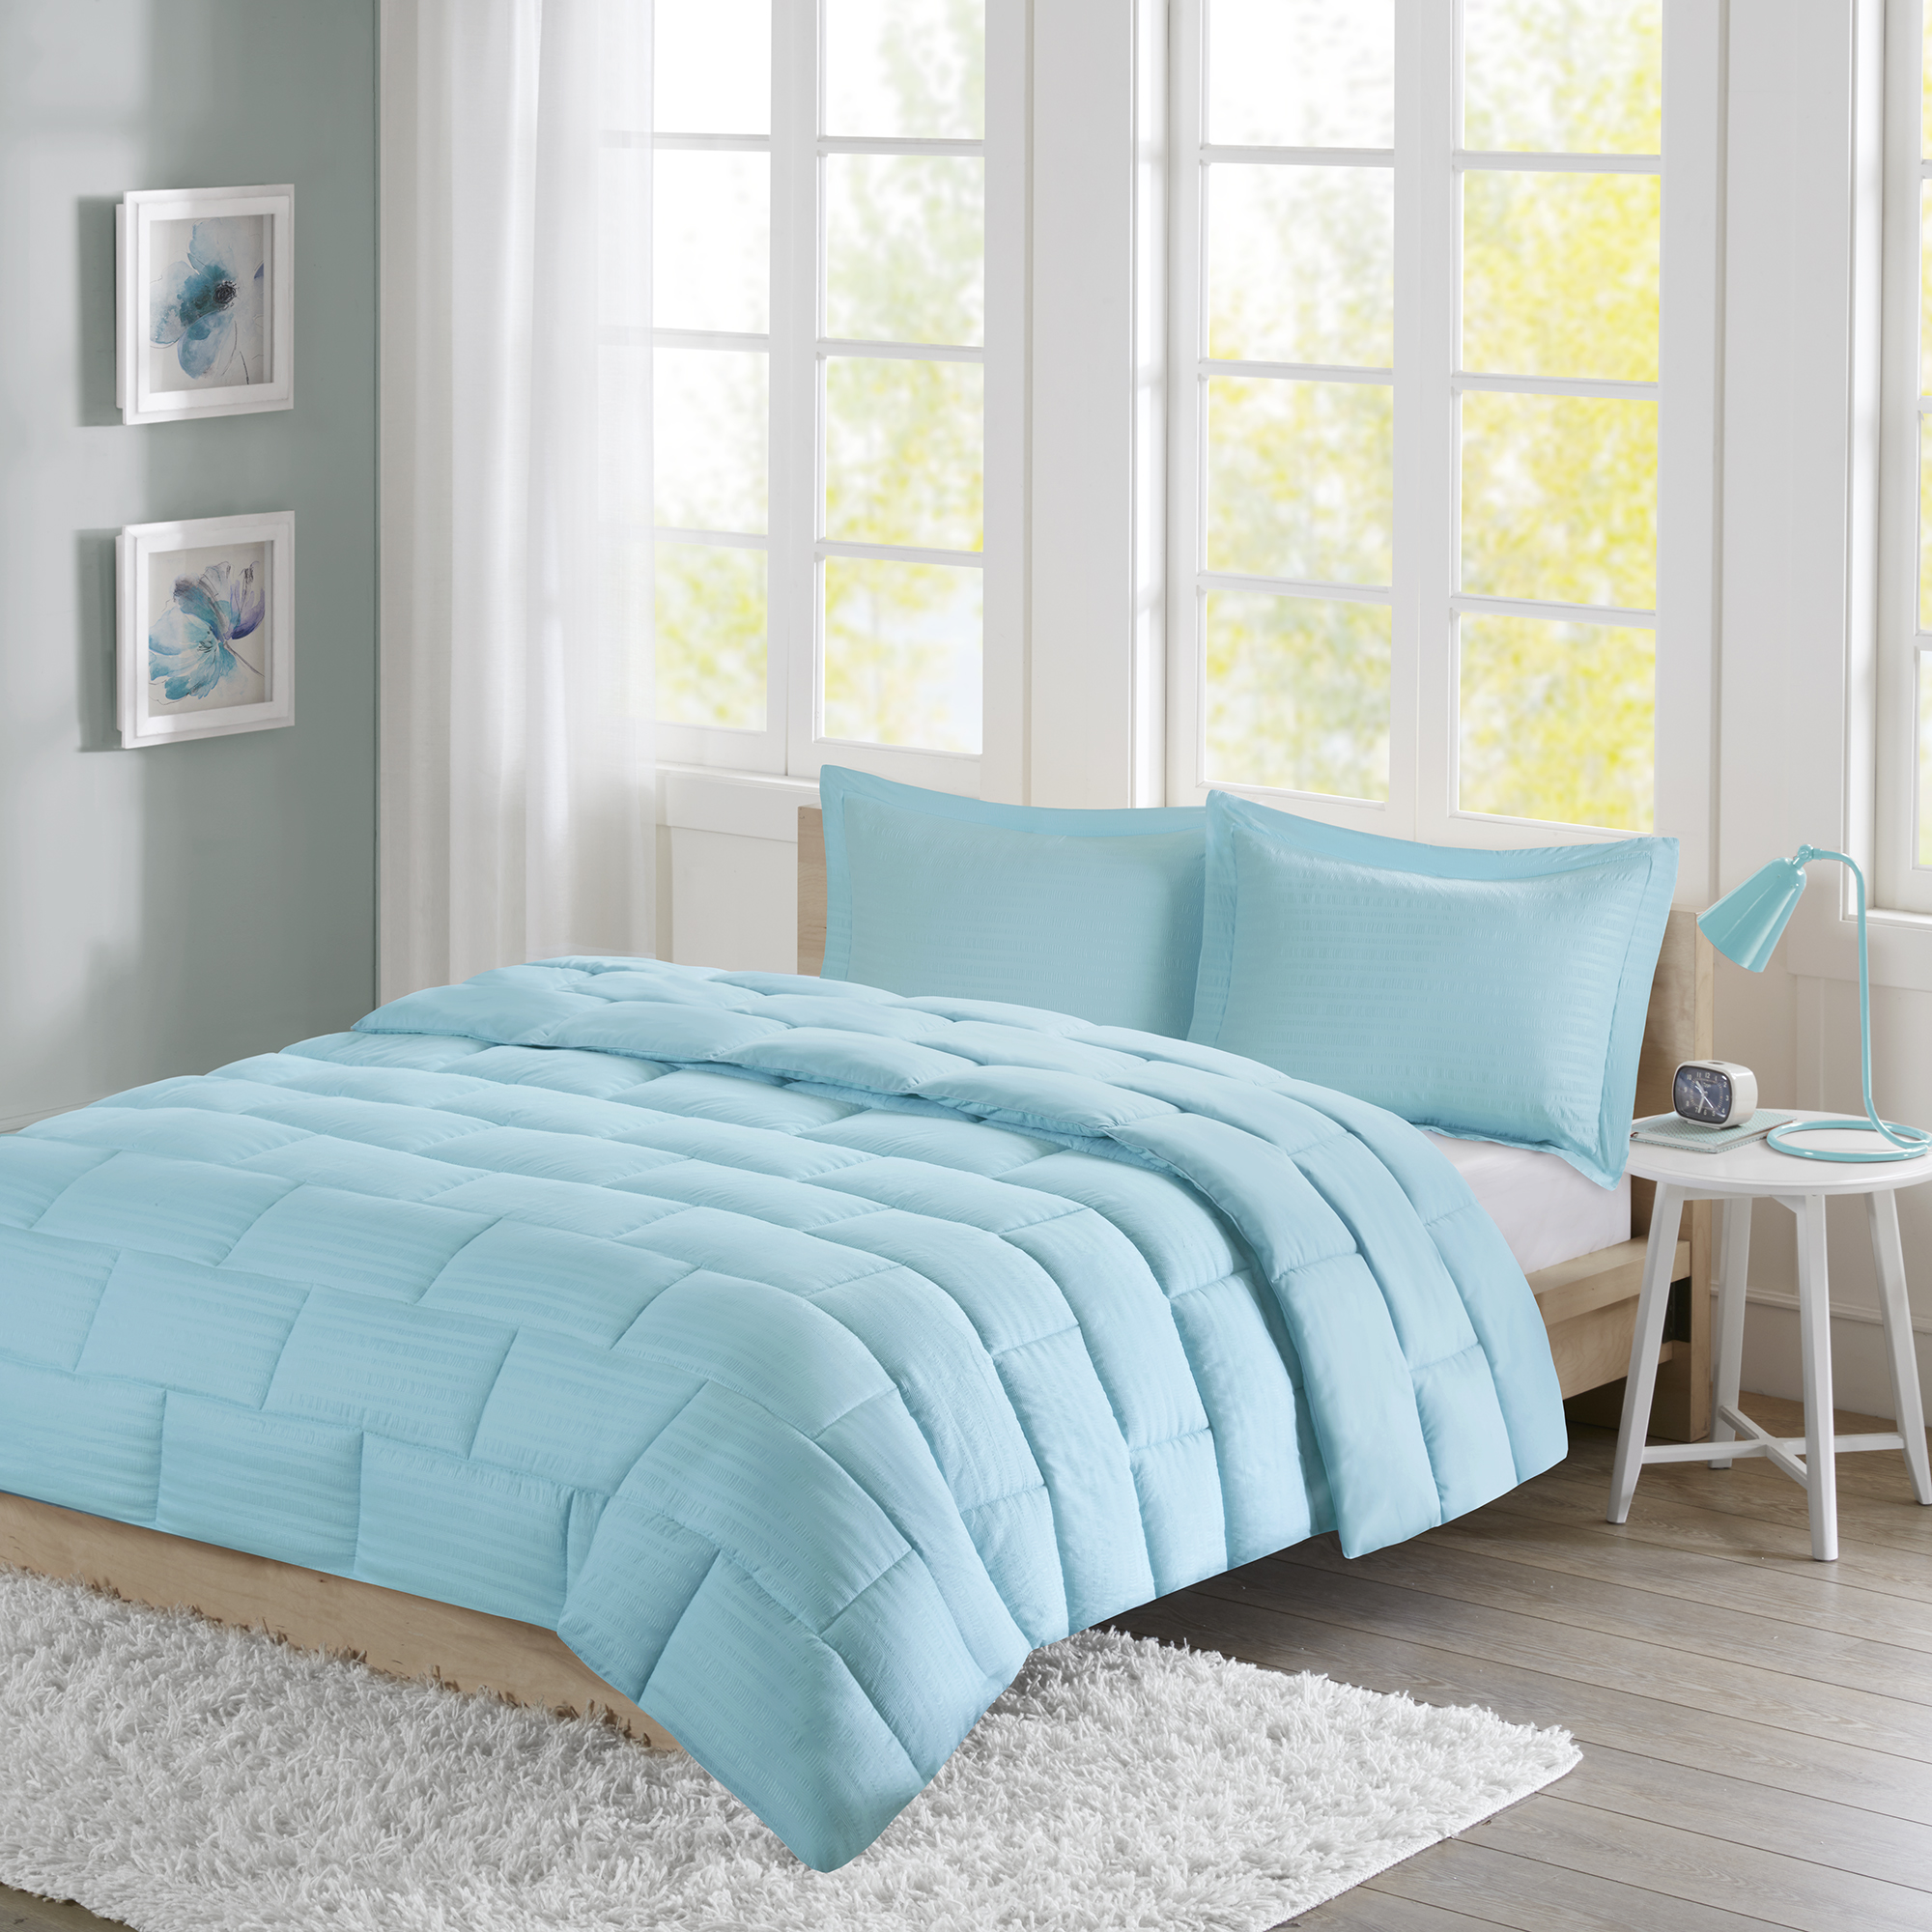 Home Essence Apartment Ava Seersucker Down Alternative Comforter Set